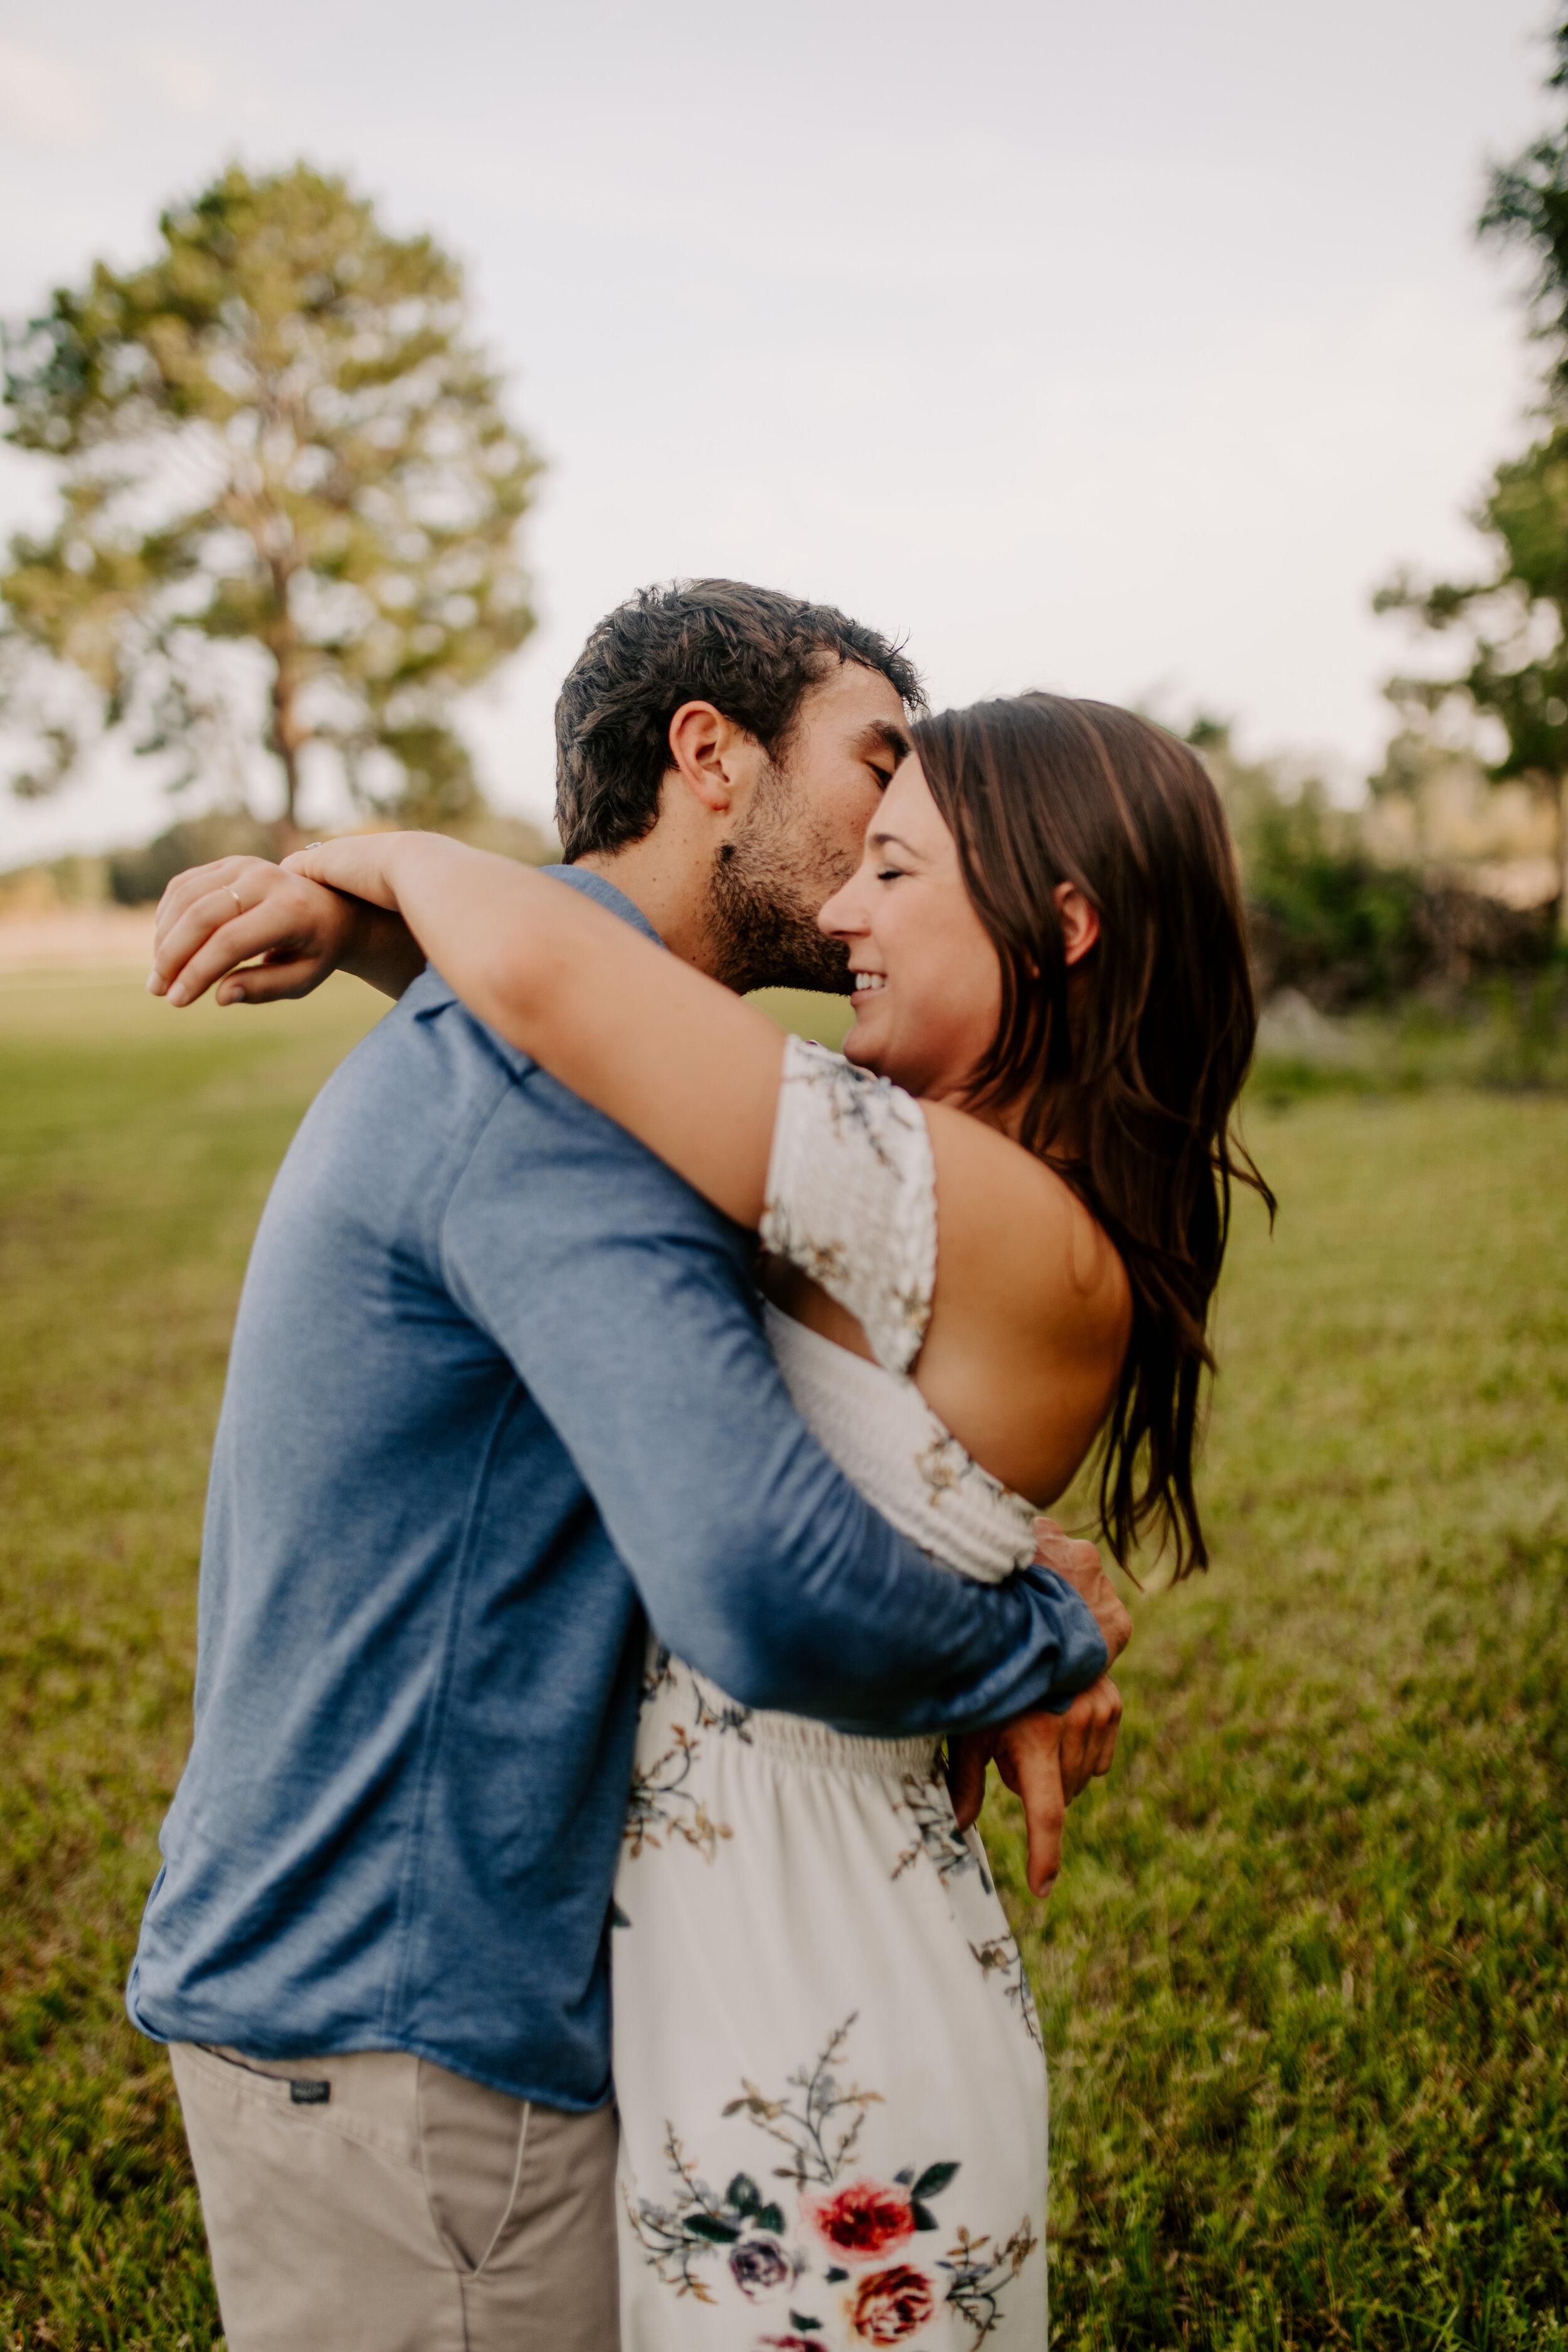 Jenna_+_Ryan_-_Native_Expressions_-_Florida_Engagement-114.jpg